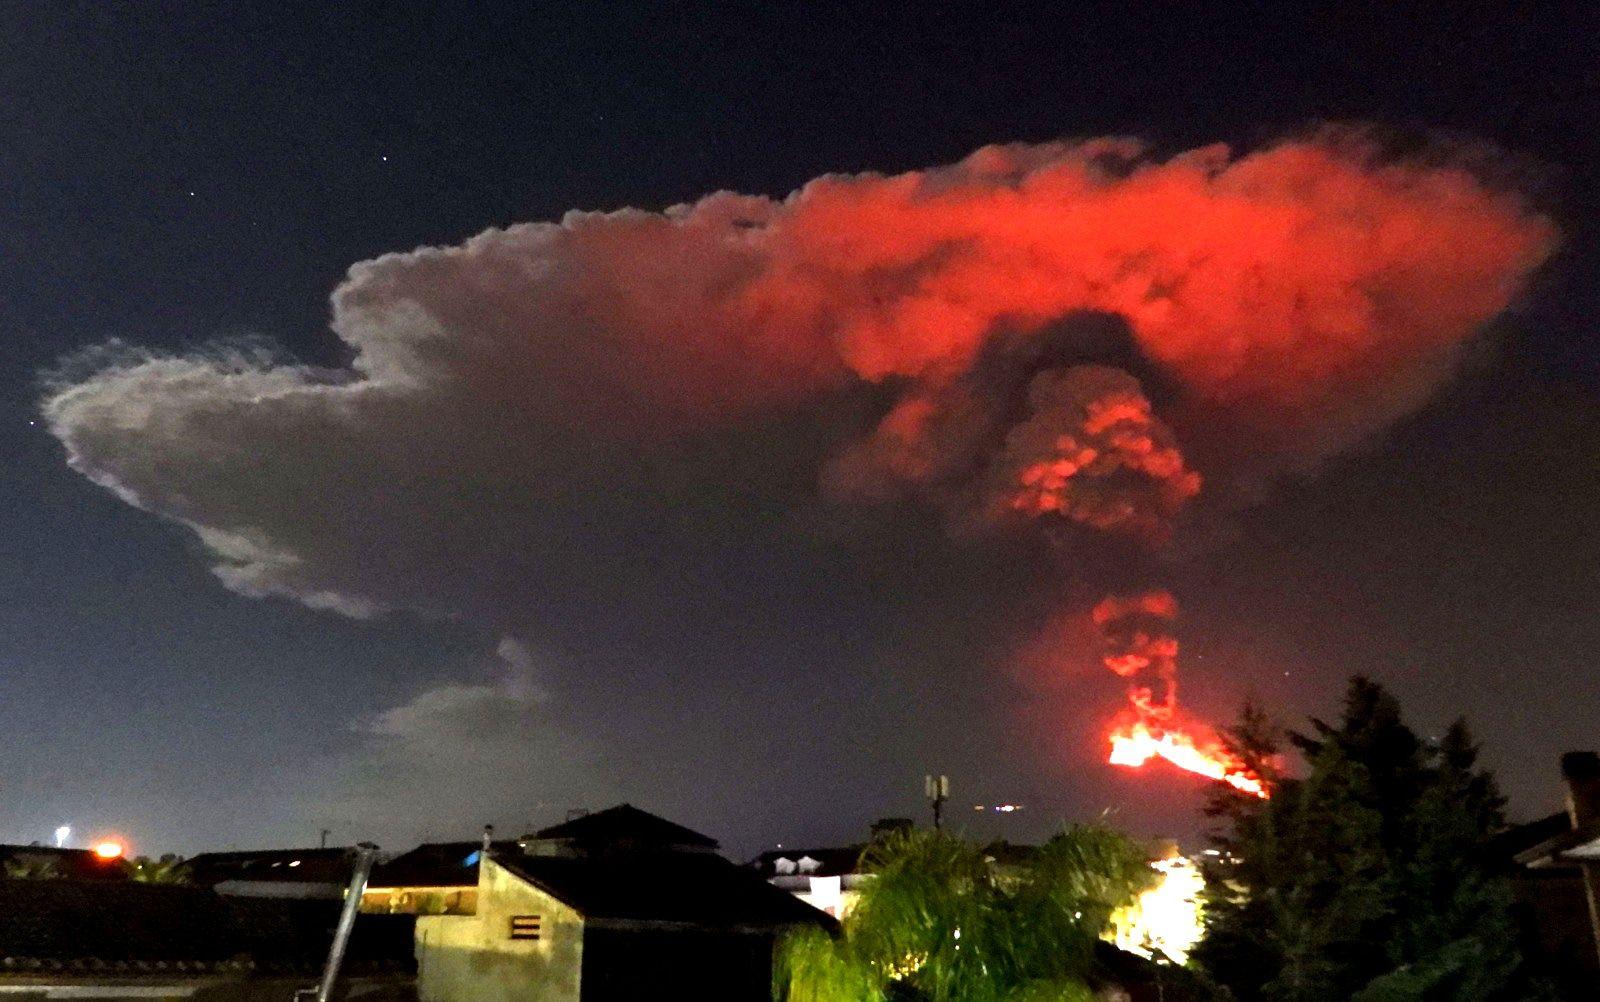 Etna - 23.02.2021 / 01h local - subplinal eruptive column seen from Tremestieri Etneo - photo Boris Behncke